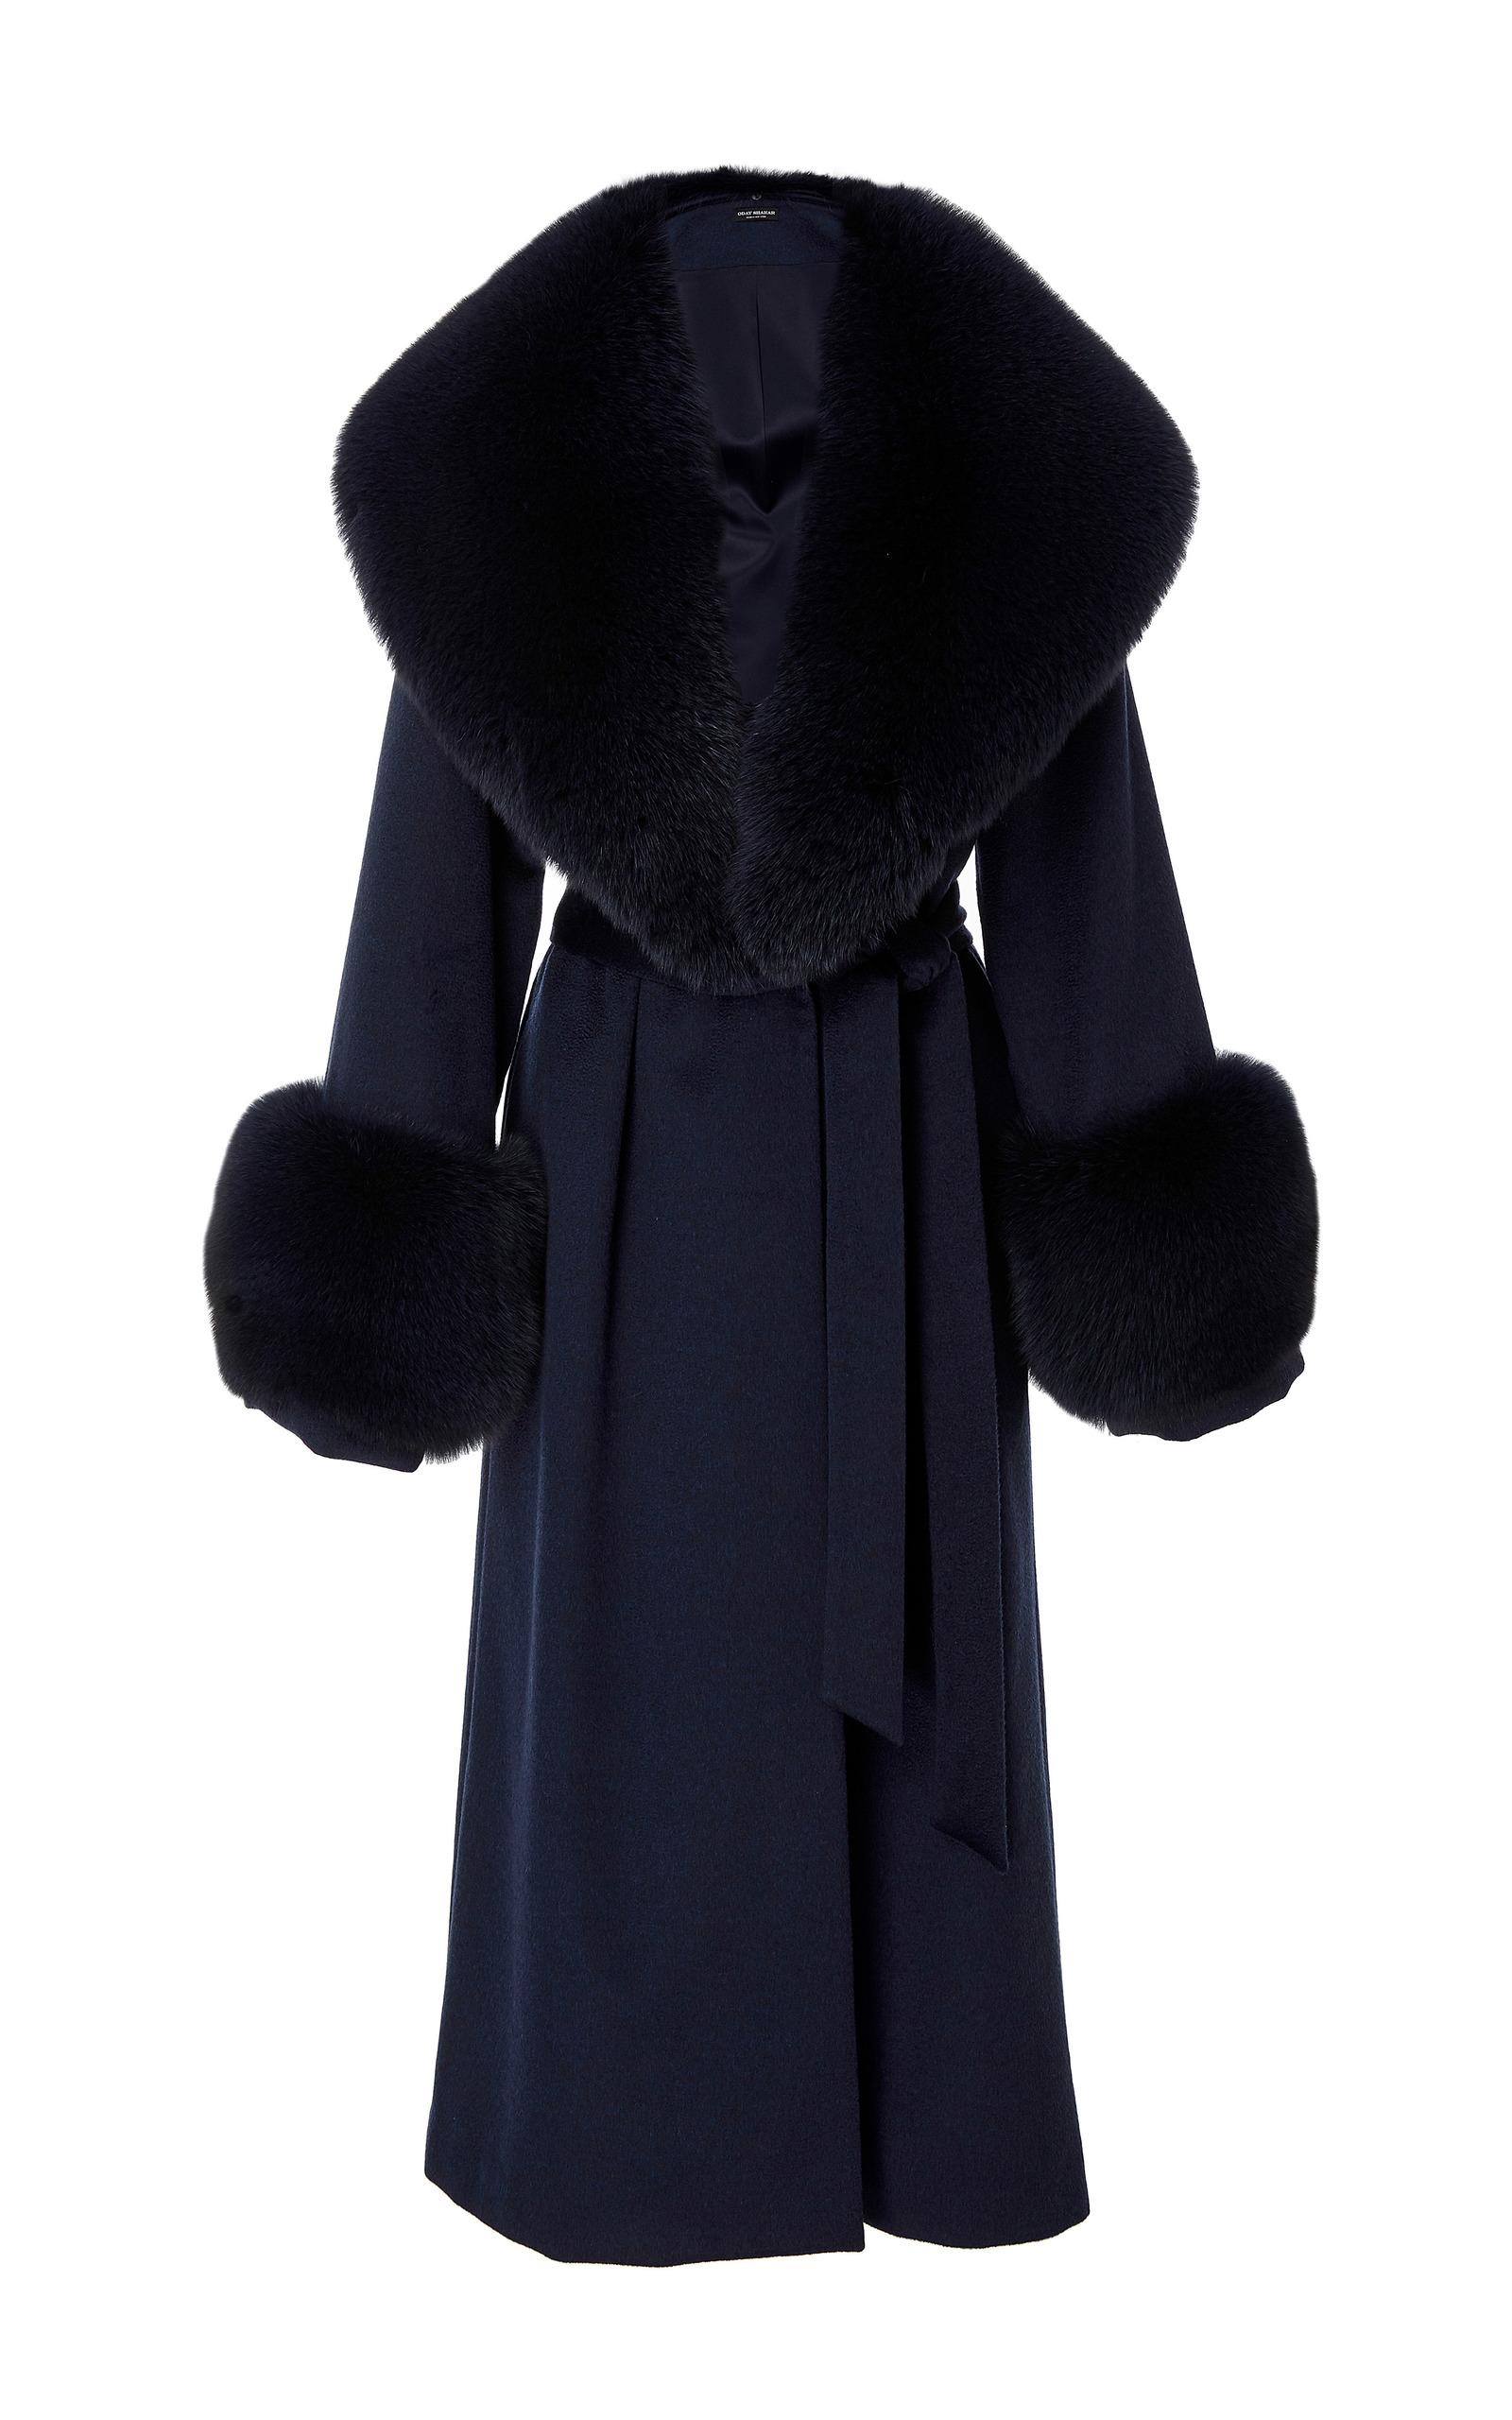 unique design buying new best wholesaler Wool Coat With Fox Fur Collar And Cuffs by Oday Shakar | Moda Operandi